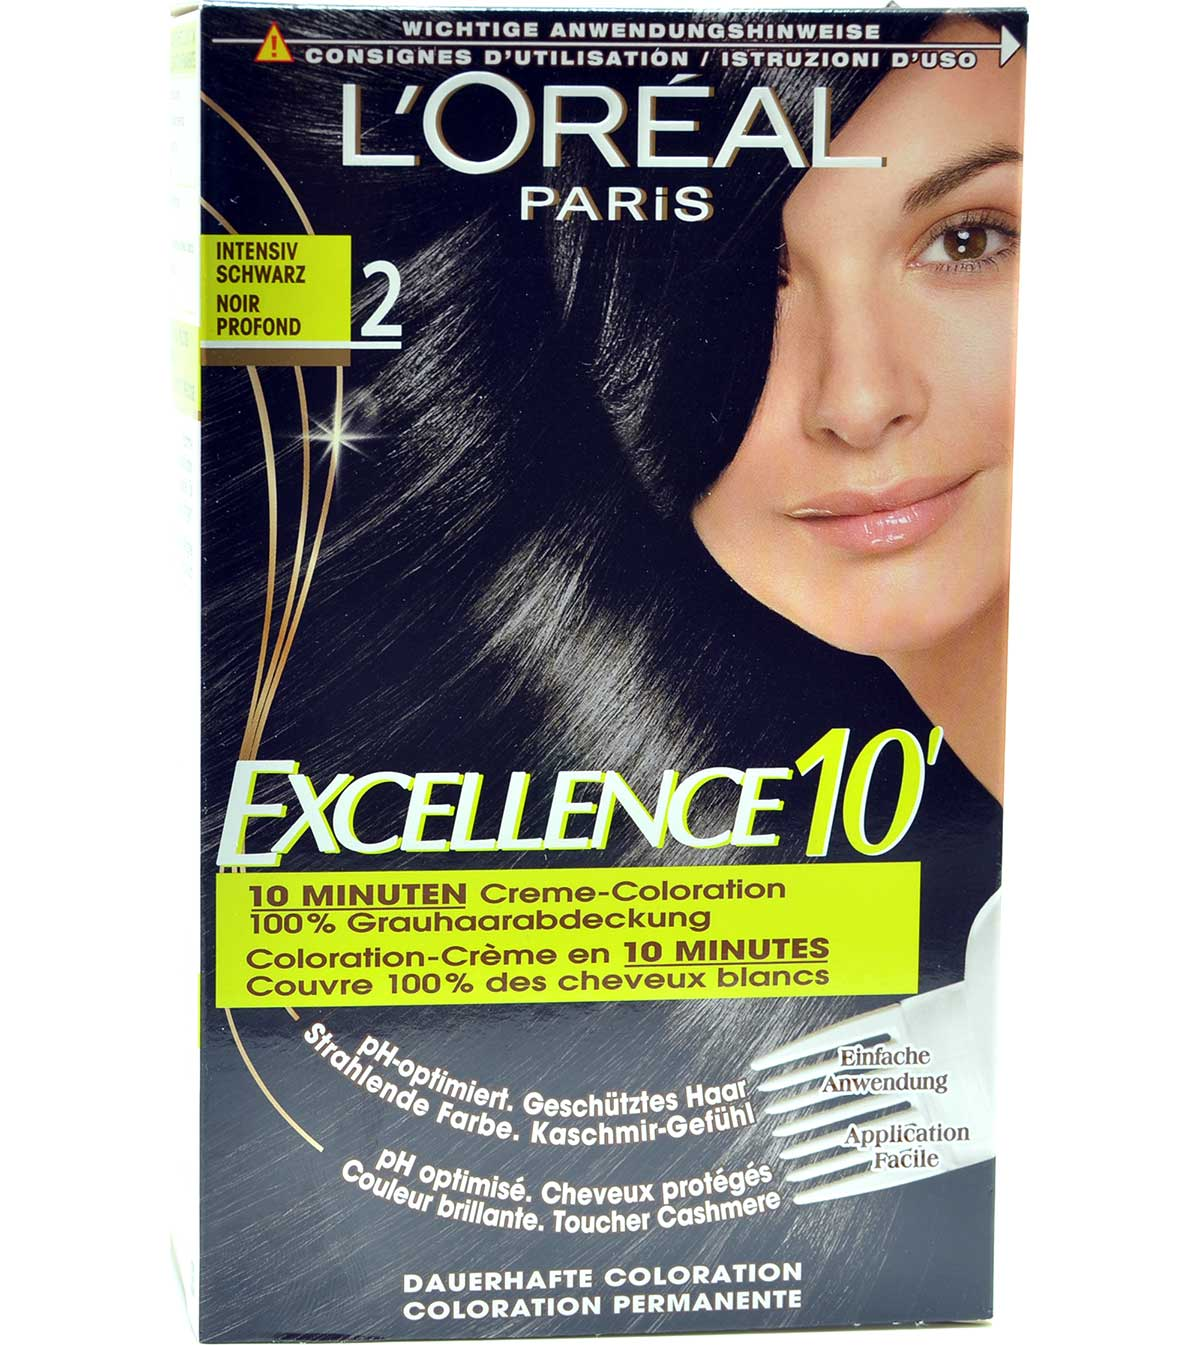 2x loreal excell10 2 0 intensiv schwarz excellence creme haarfarbe - 10 minuten haarfarbe ...